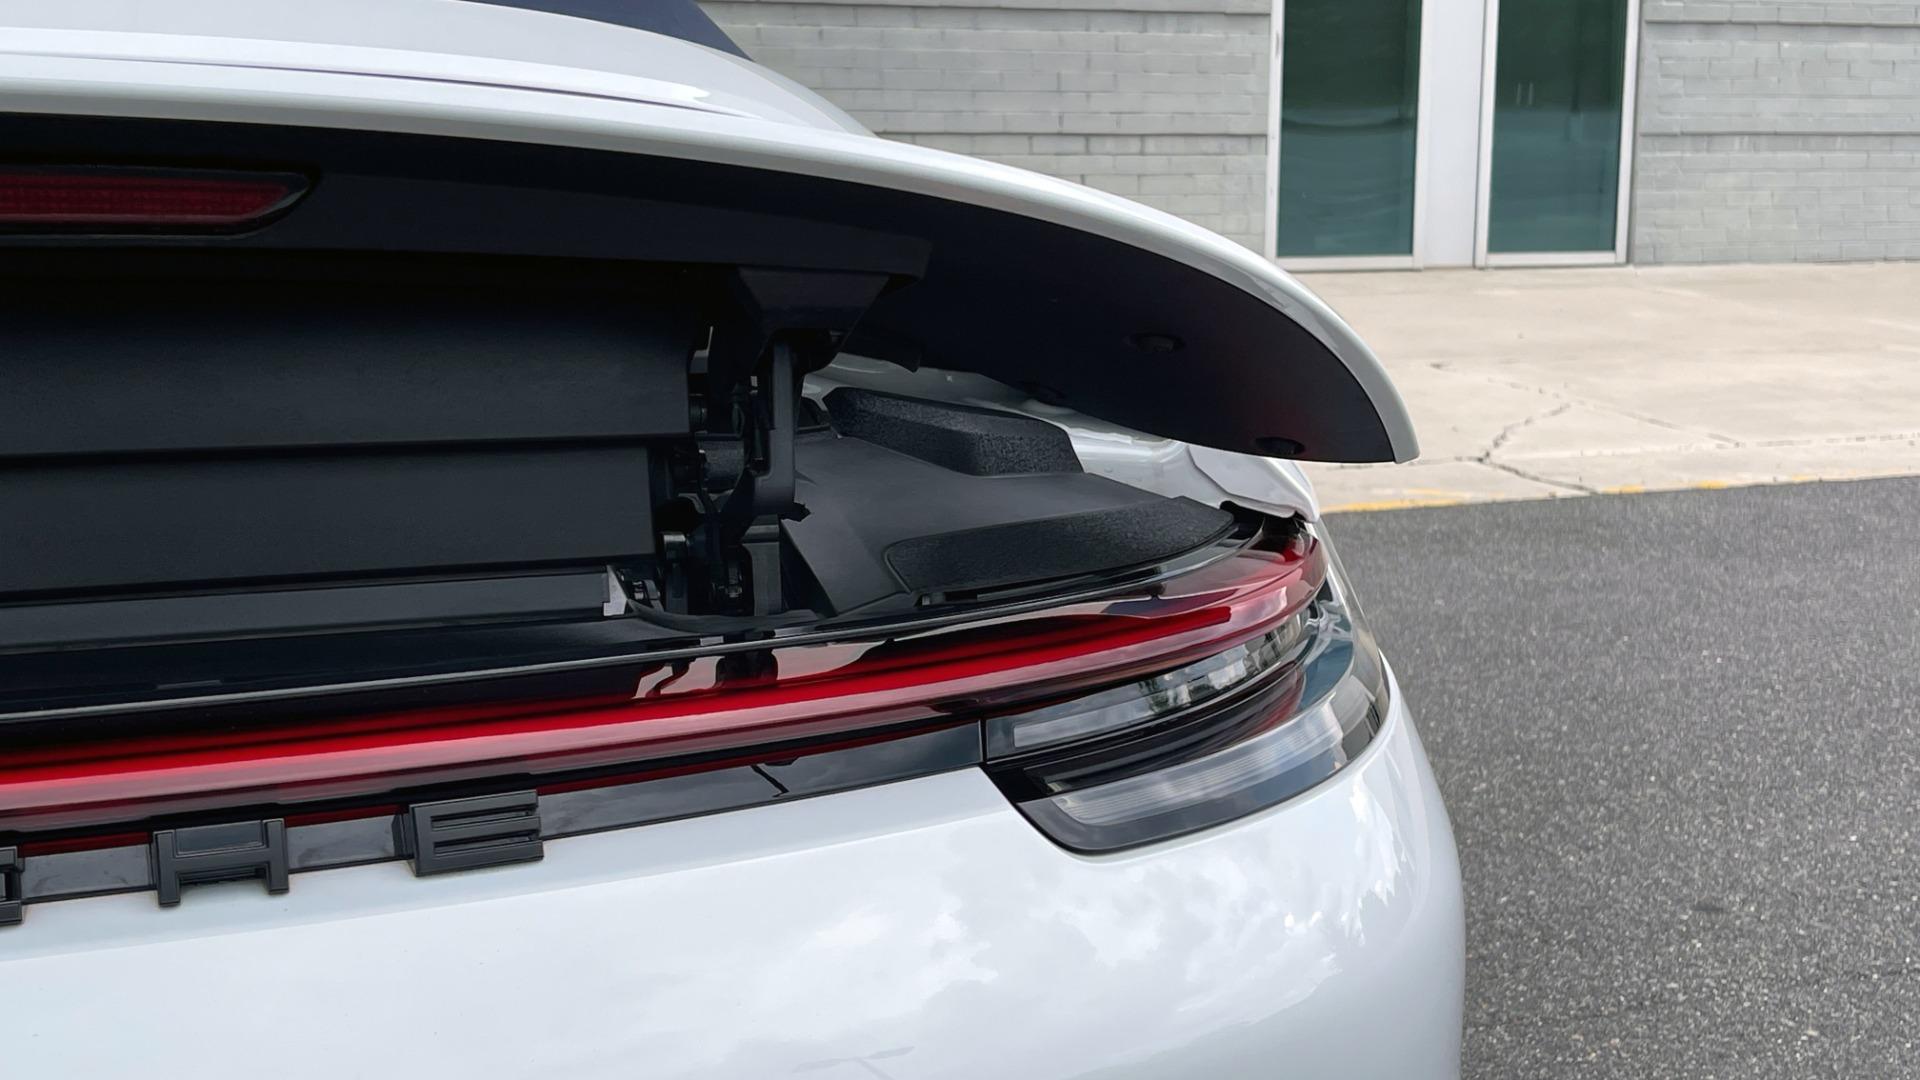 Used 2020 Porsche 911 CARRERA 4S CABRIOLET PREMIUM SPORT PKG / NAV / BOSE / LIGHT DESIGN PKG for sale $167,595 at Formula Imports in Charlotte NC 28227 35